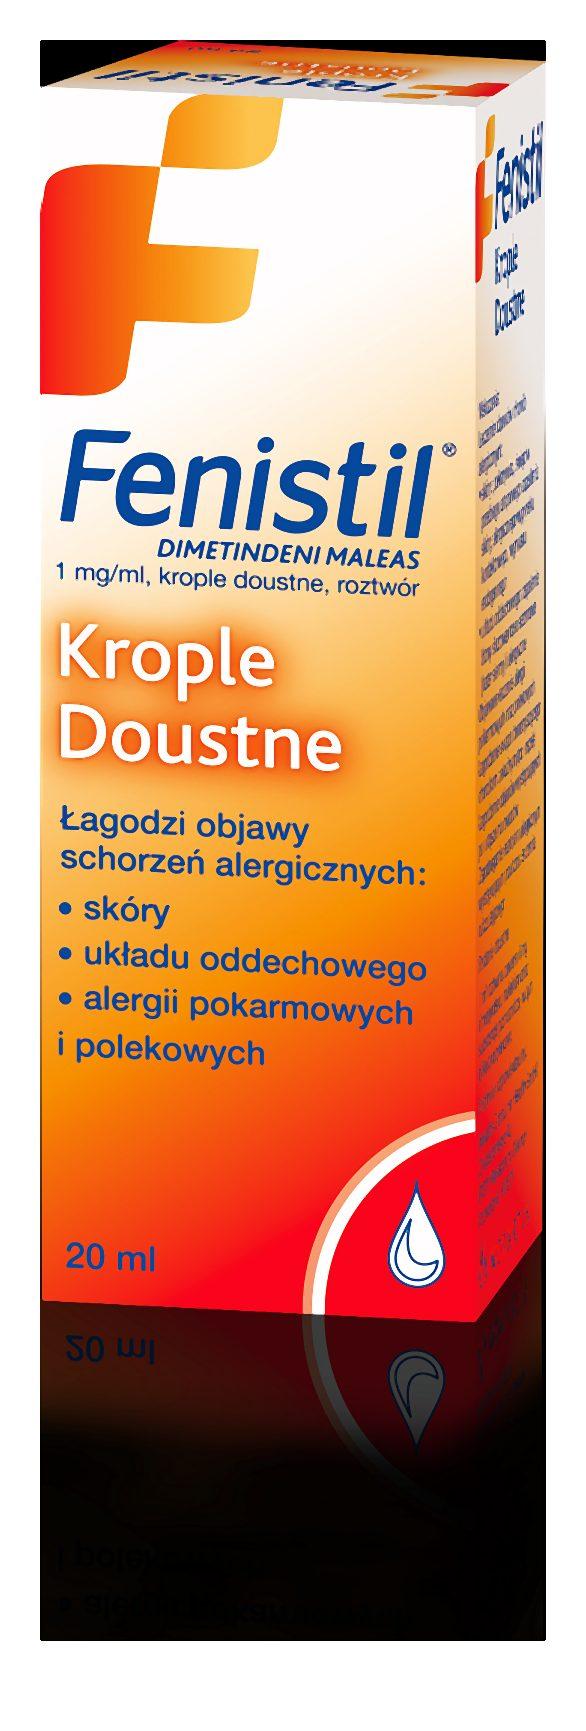 Fenistil_krople_packshot_new-003-2014-08-18 _ 02_07_04-80